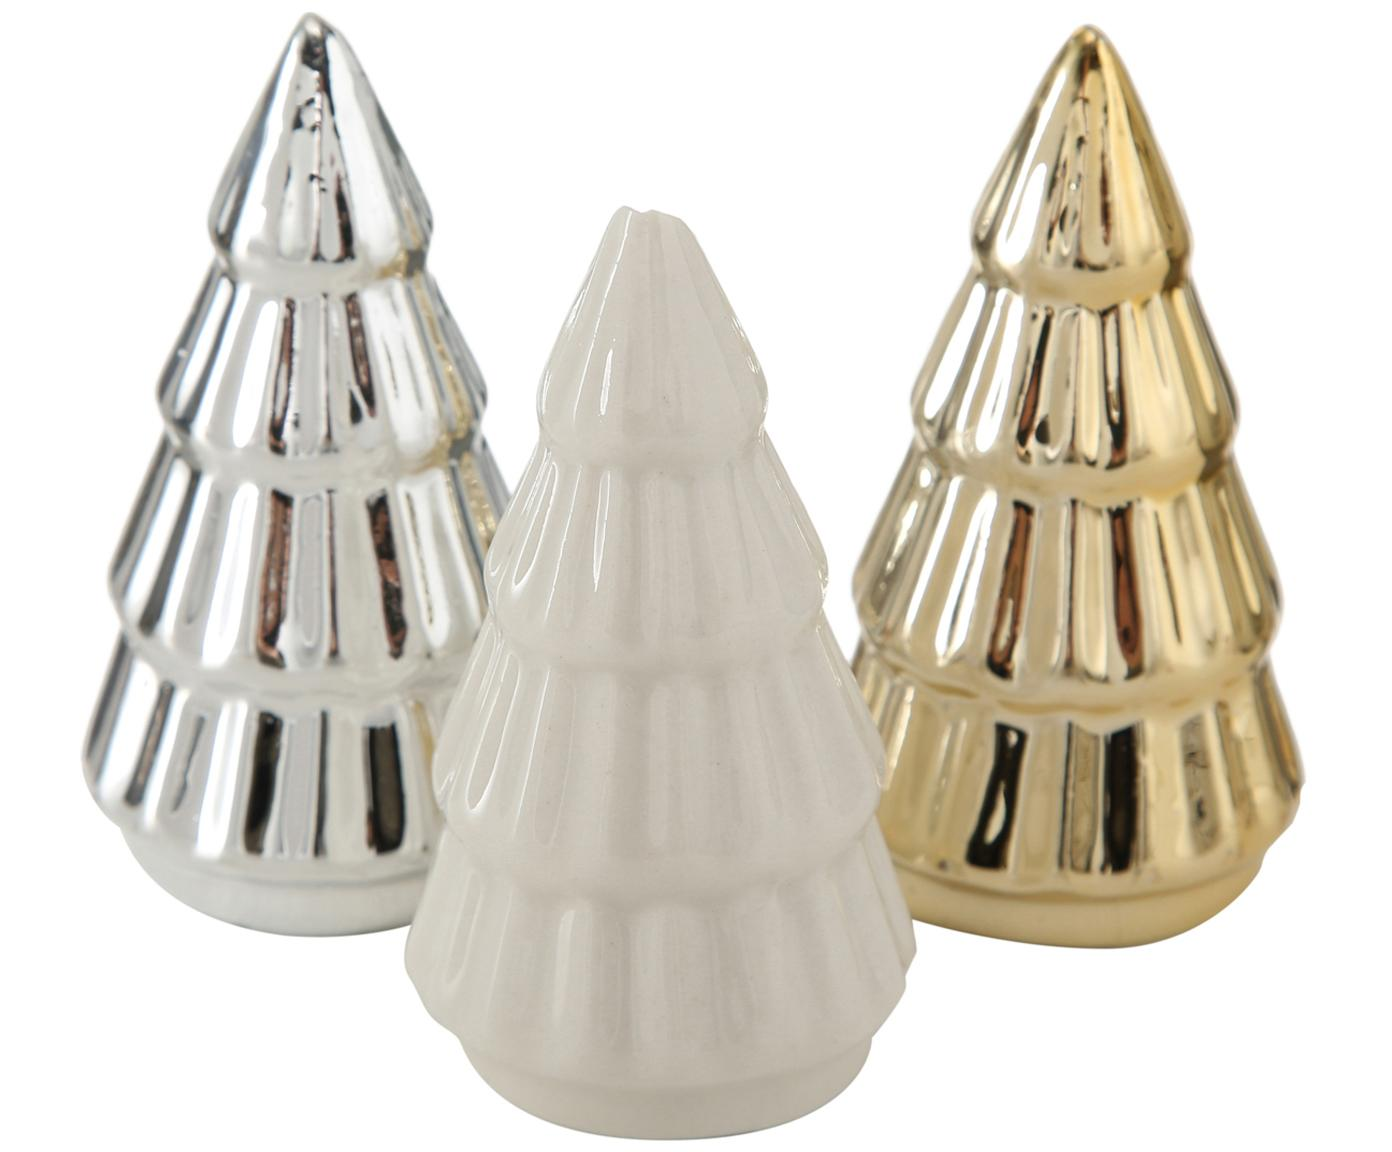 Decoratieve objectenset Glamory, 3-delig, Porselein, Wit, zilverkleurig, goudkleurig, Ø 4 x H 8 cm